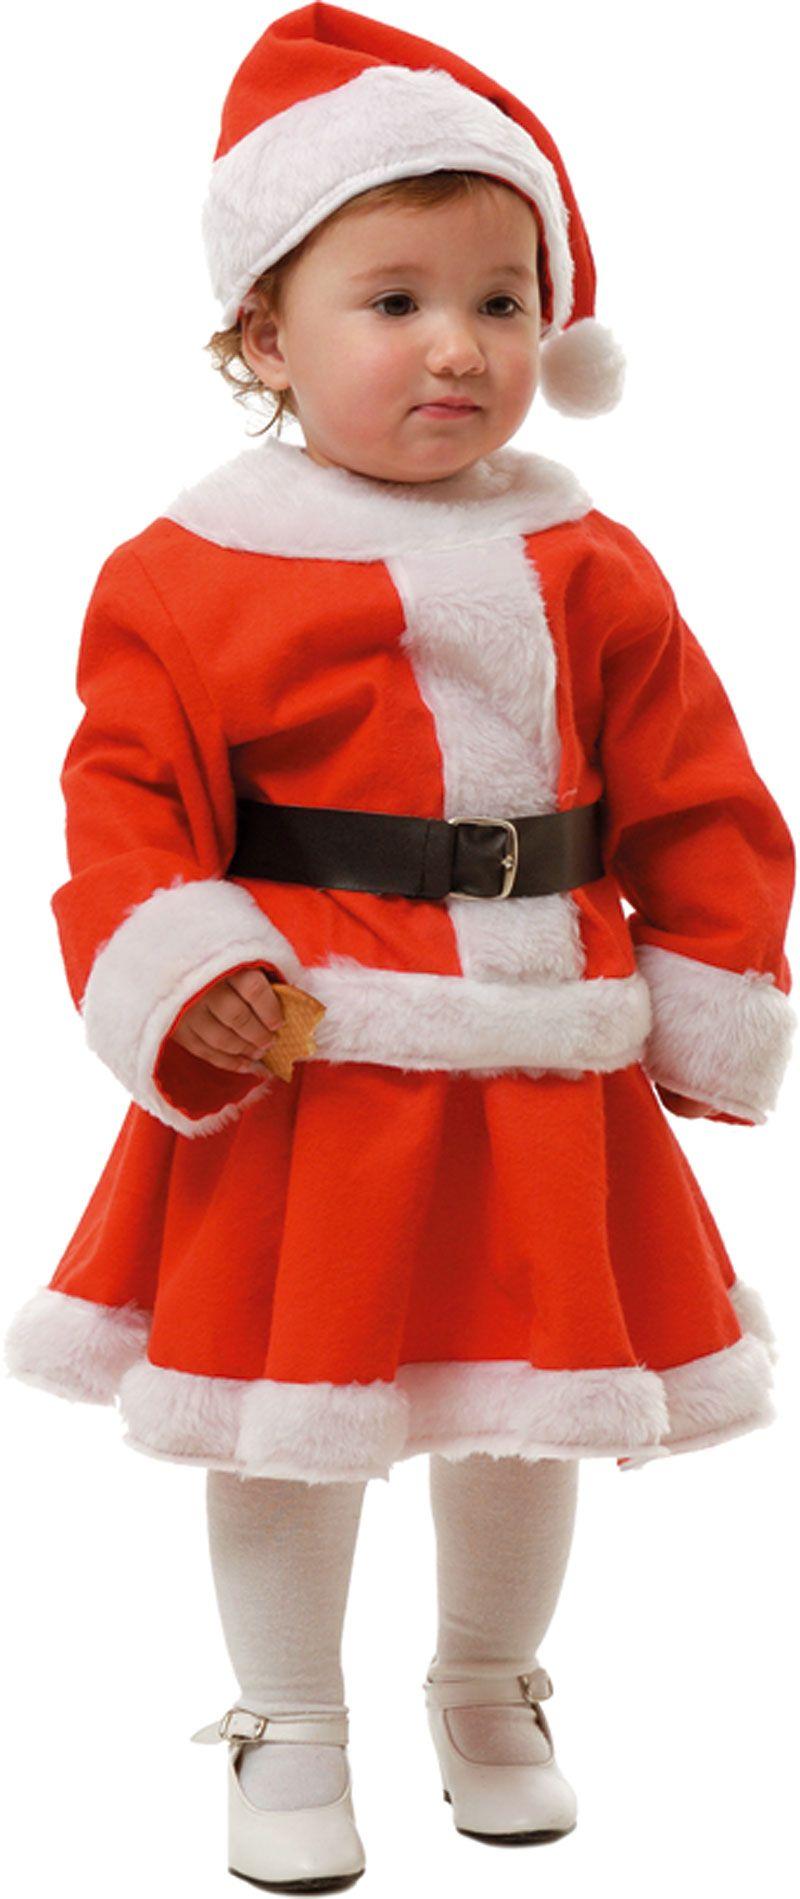 Disfraz mam noel infantil disfraces navidad christmas - Disfraces navidenos para ninas ...